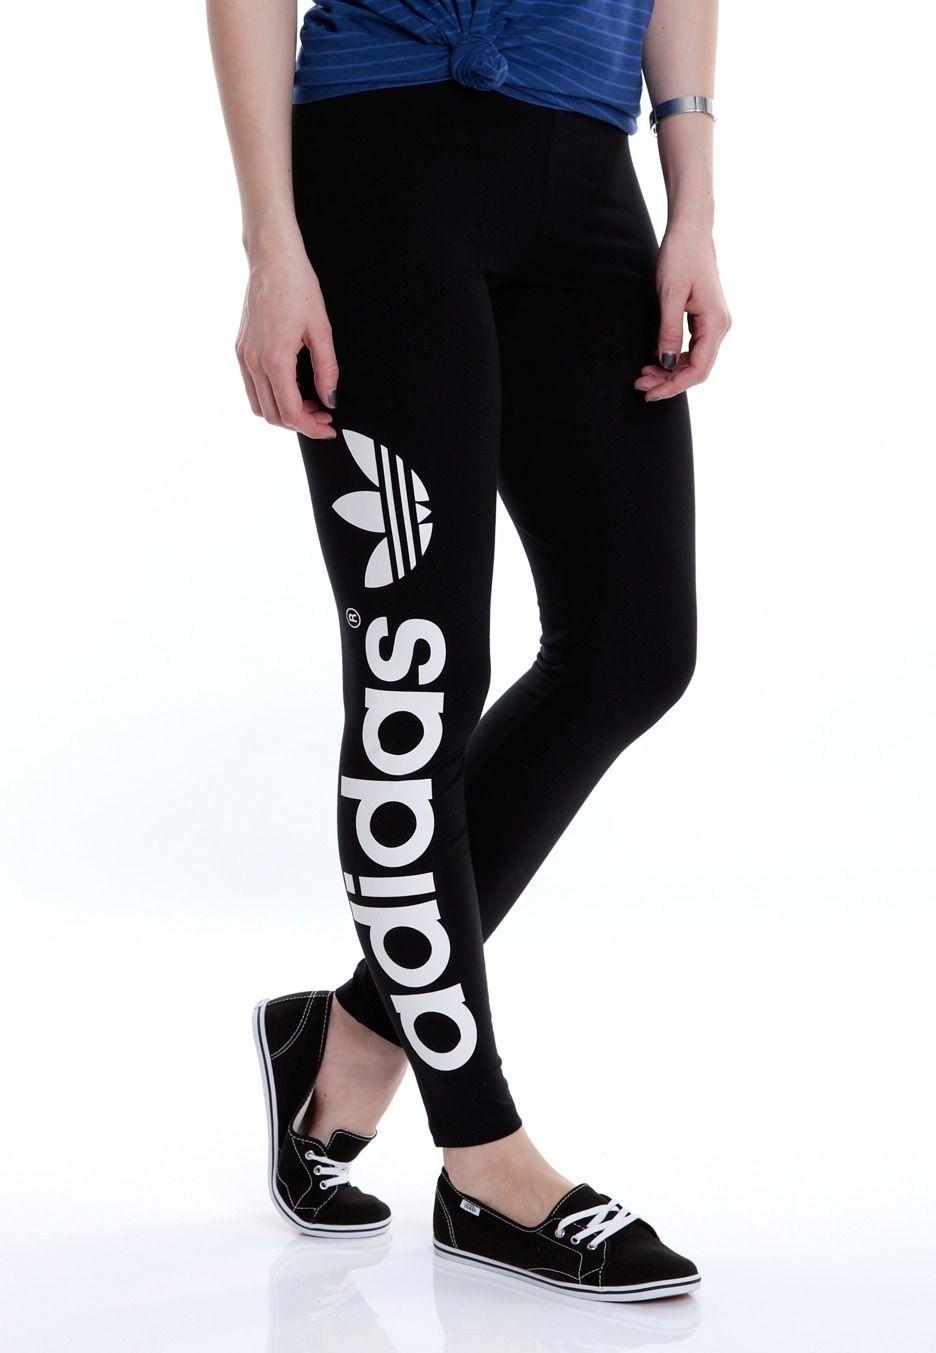 dd73ed24836a0f Adidas leggings   Clothes   Women's fashion leggings, Sneakers ...